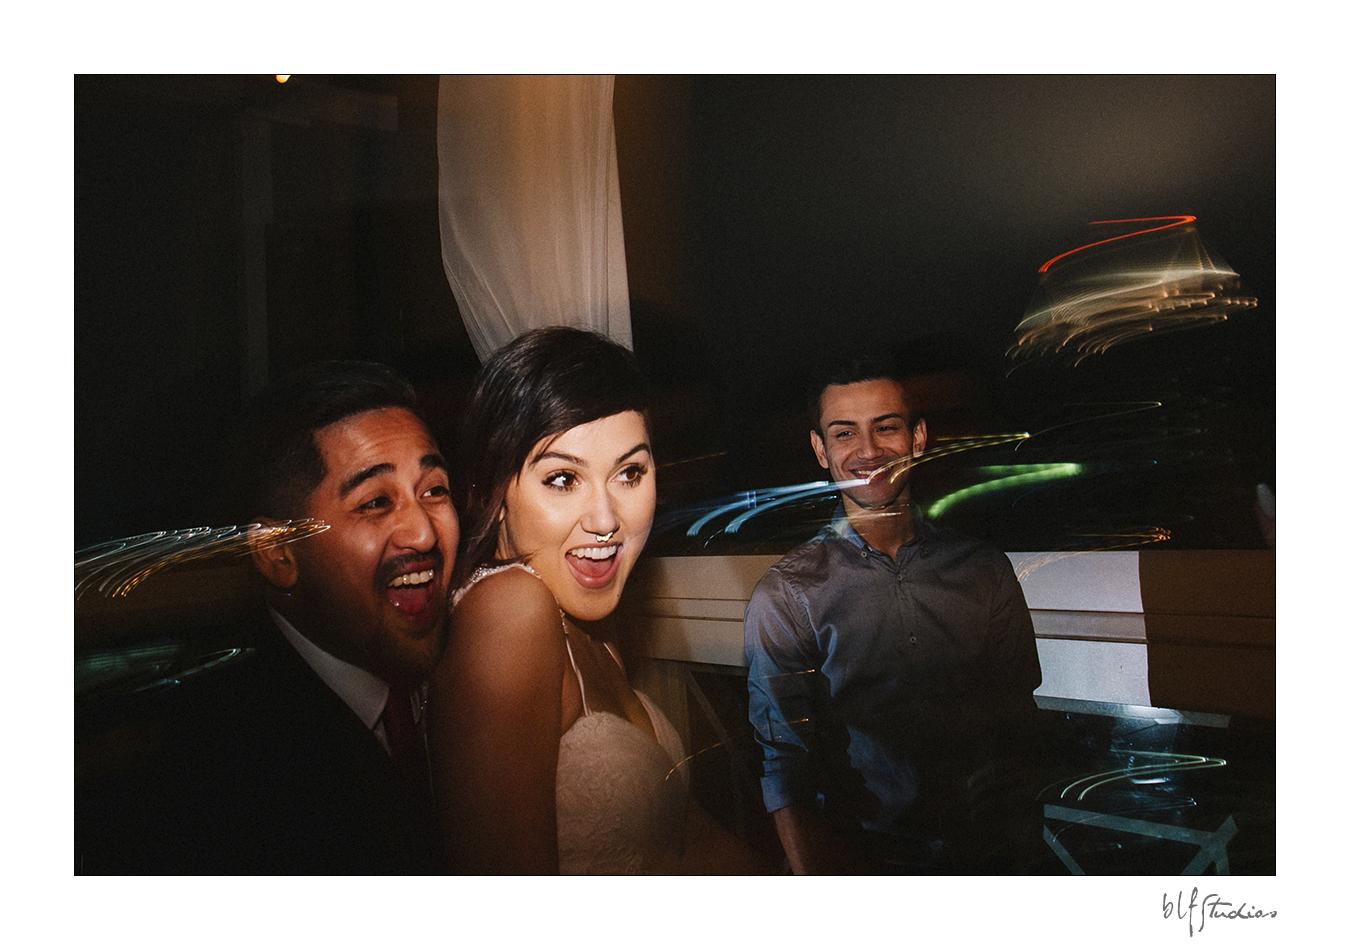 0050-blfstudios-wedding-photographer-daniel-danielle-atlanta.jpg